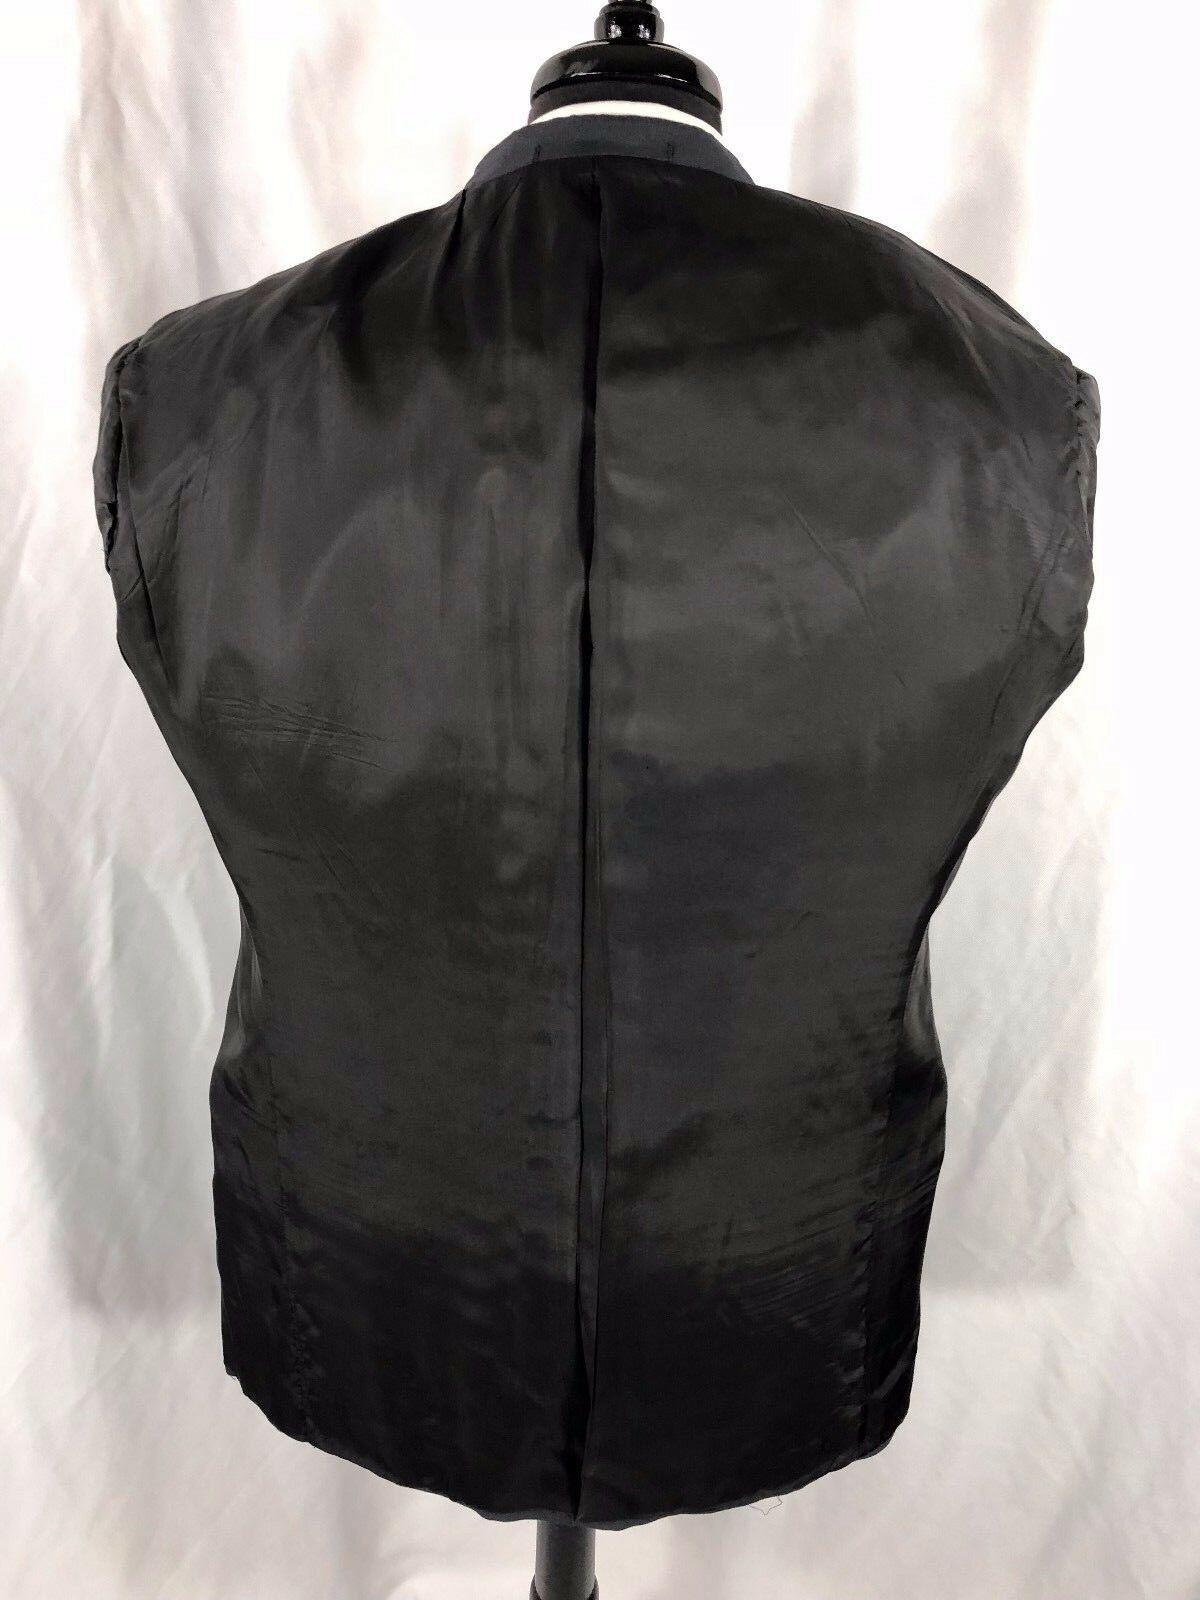 Armani Collezioni Men's Gray Blazer Wool Silk Blend Blazer Jacket Sport Coat 42R